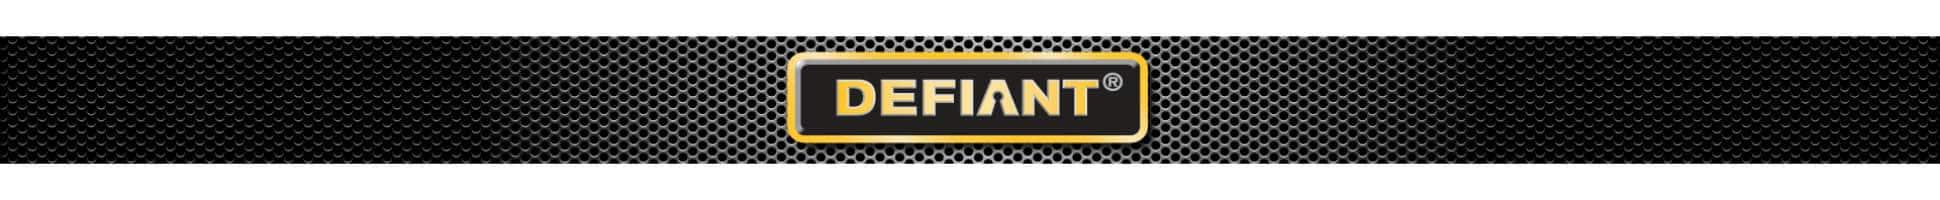 Defiant Brand Logo